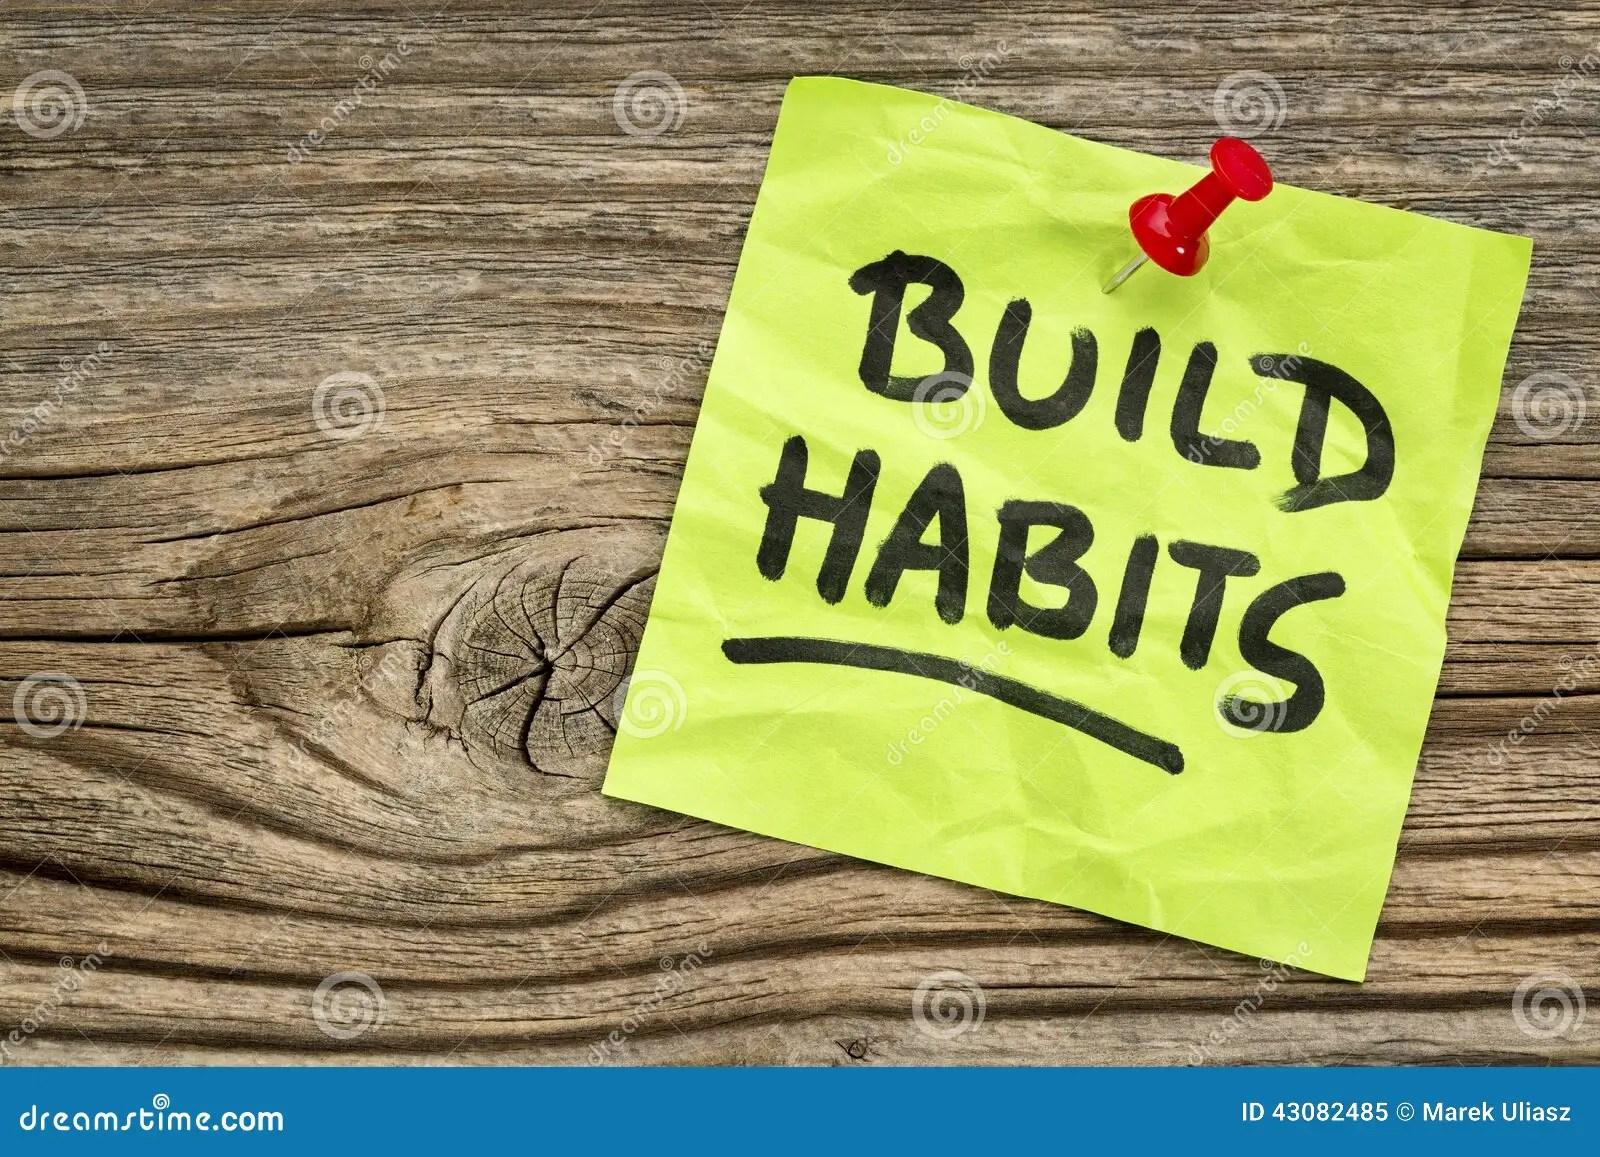 Build Habits Reminder Stock Image Image Of Reminder